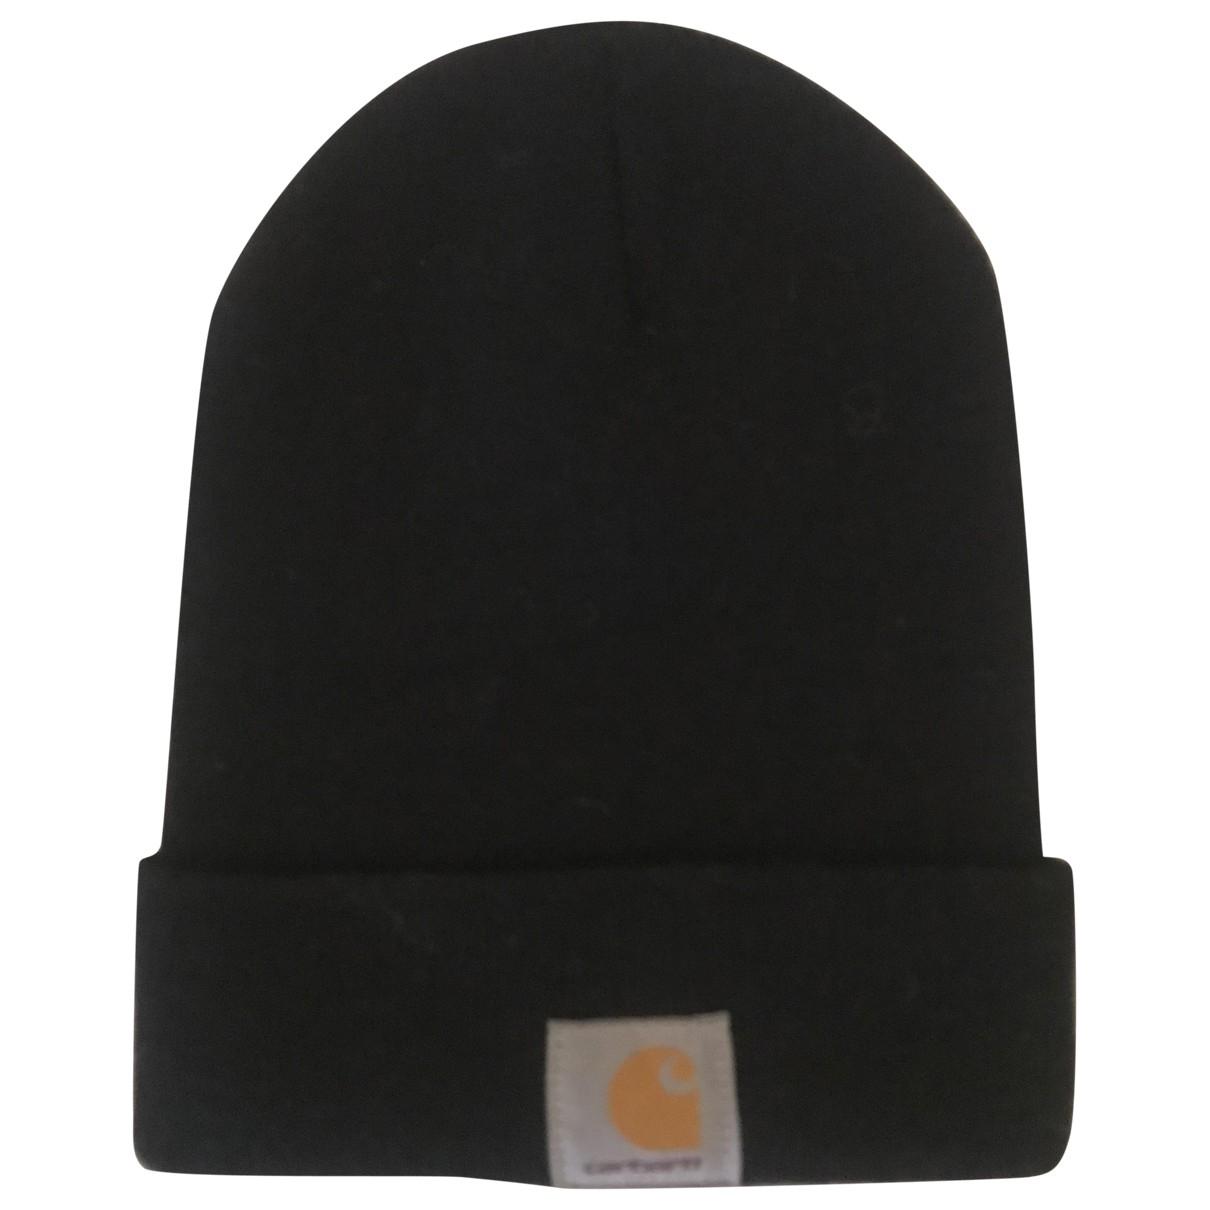 Carhartt \N Black Cotton hat for Women M International